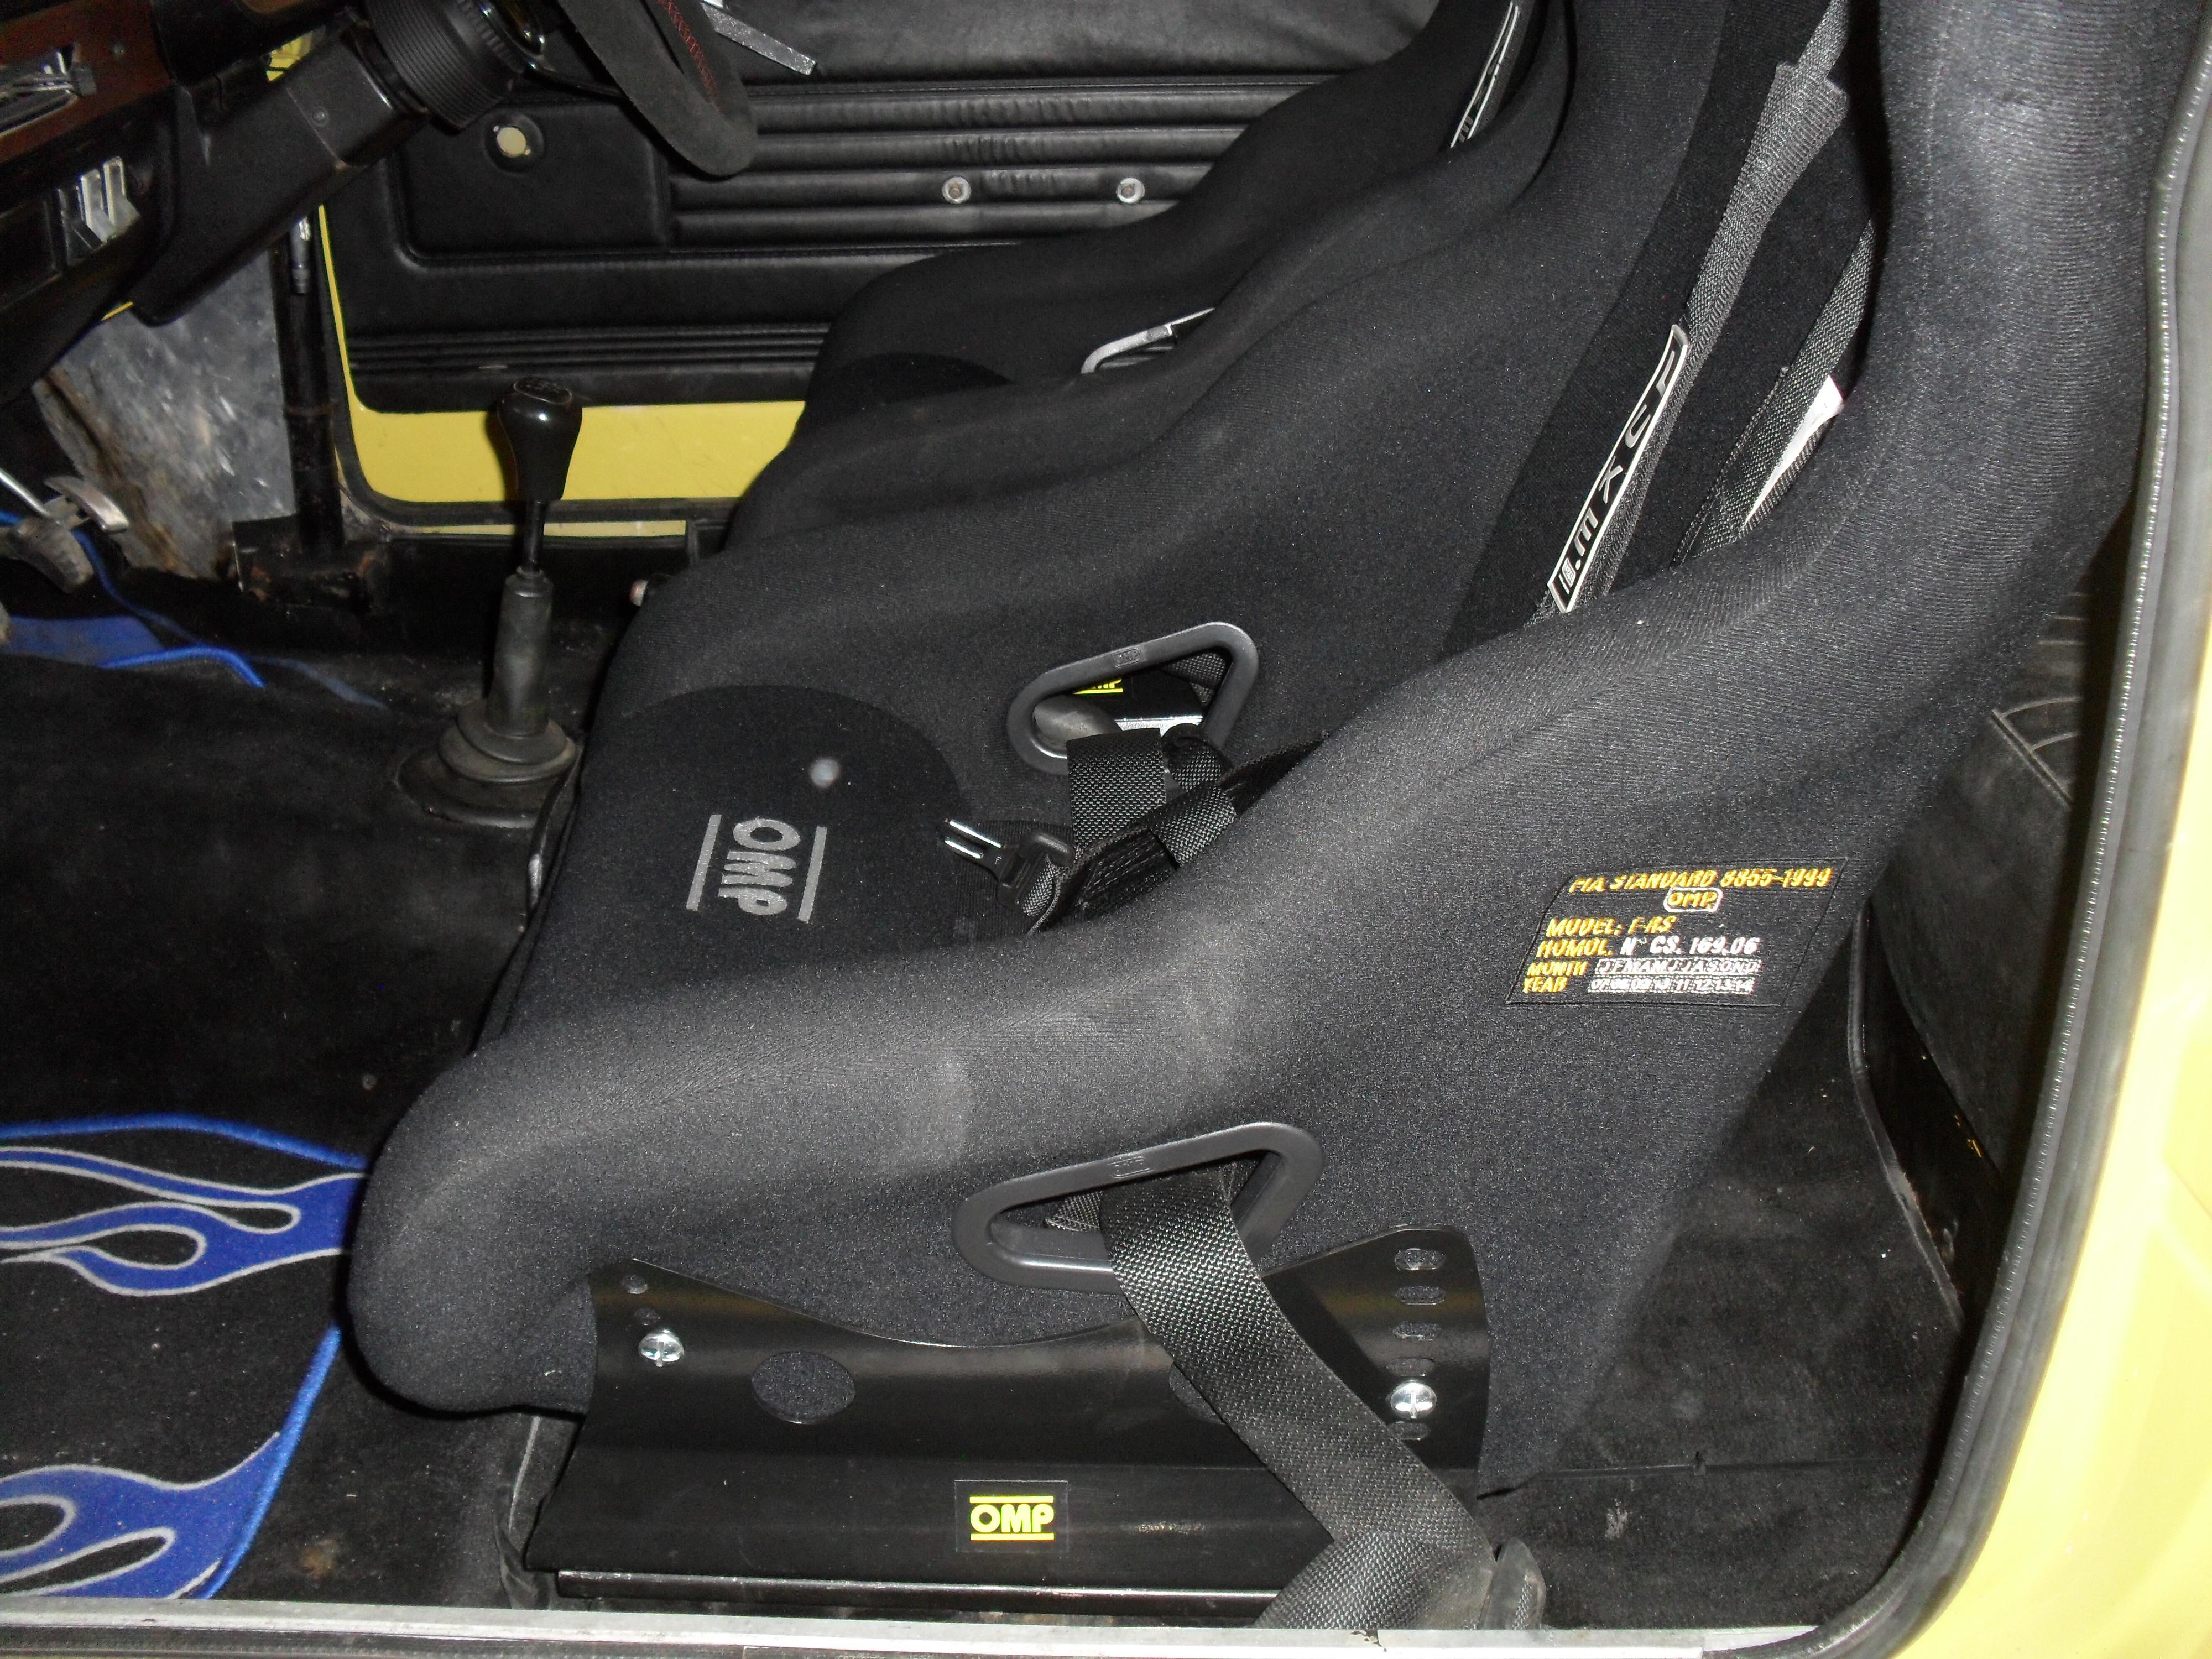 8x13 Revos 9x13 Revos And Omp Bucket Seats